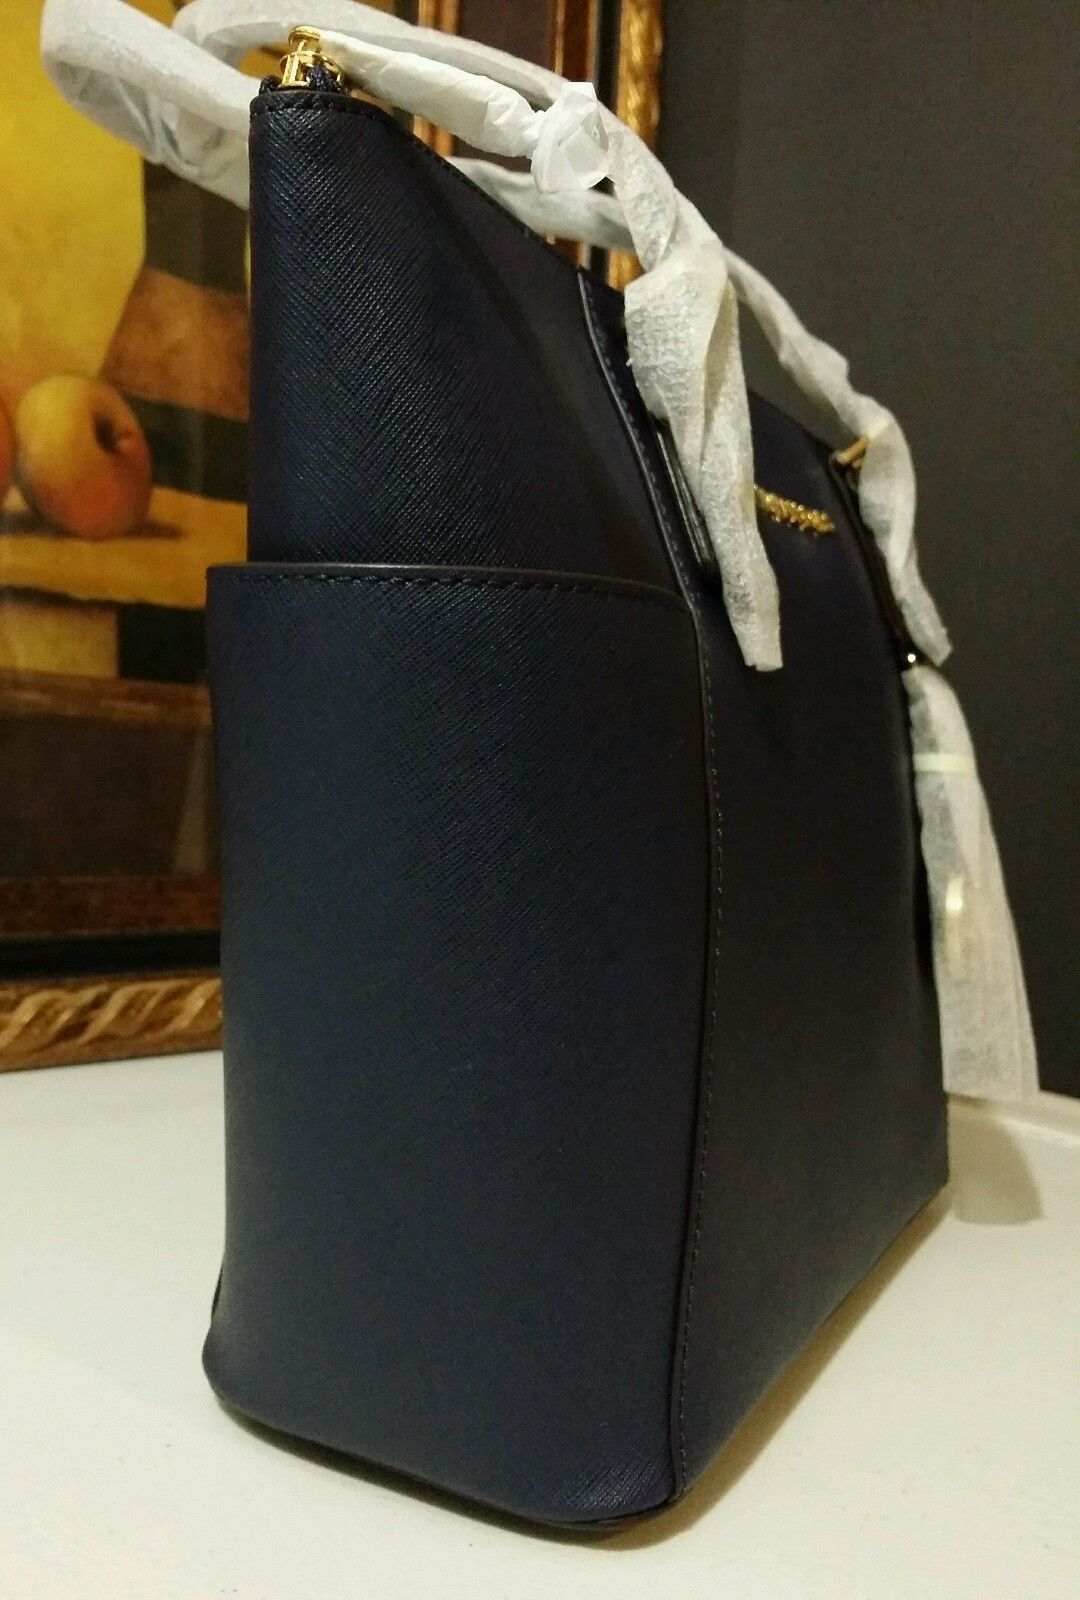 NWT MICHAEL KORS Jet Set East West Top Zip Saffiano Leather Tote Bag Navy